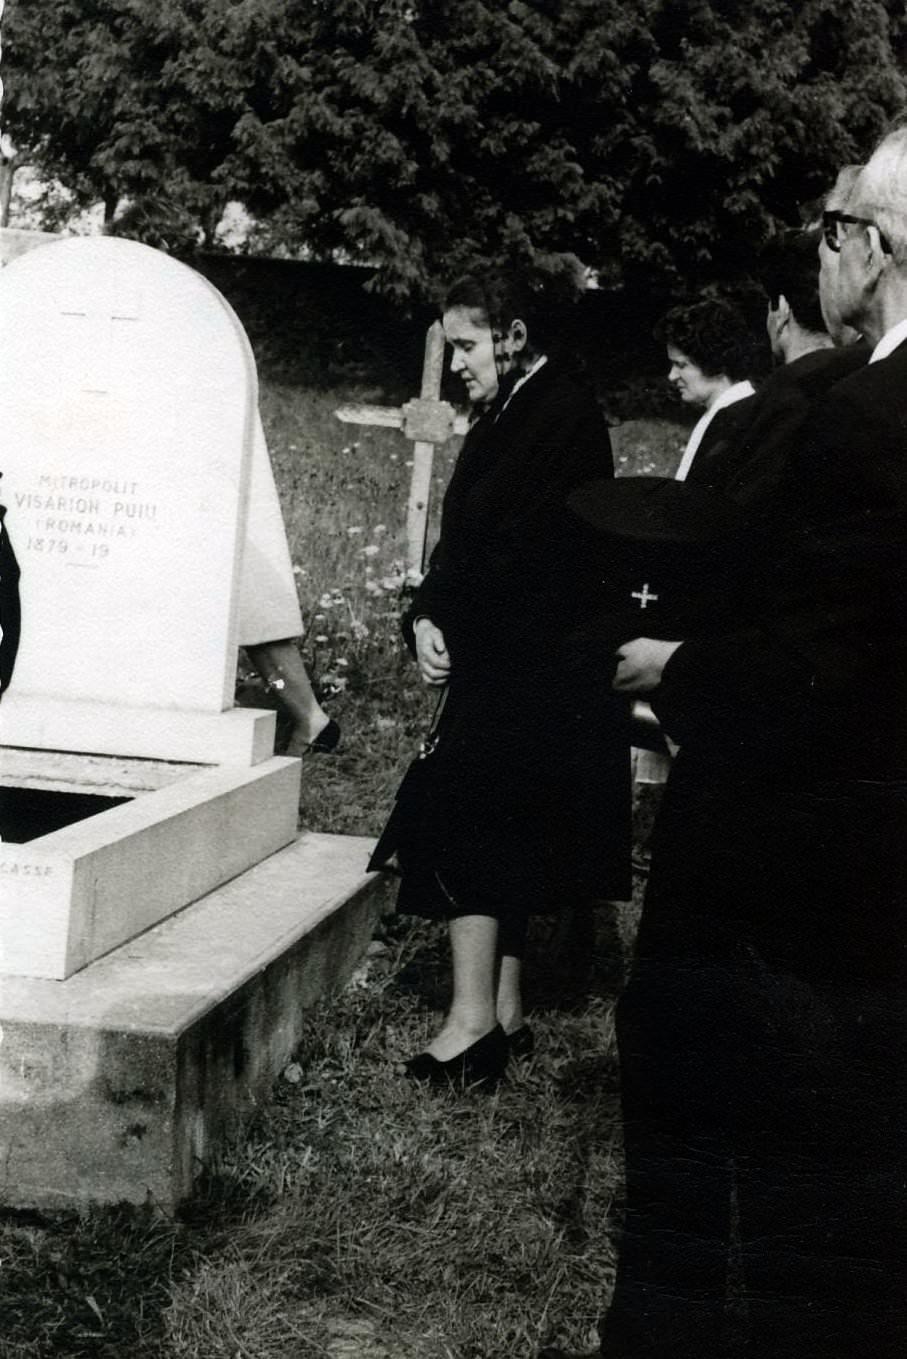 Mitropolitul Visarion Puiu - cimitirul din Viels-Maisons (Aisne) hp 4